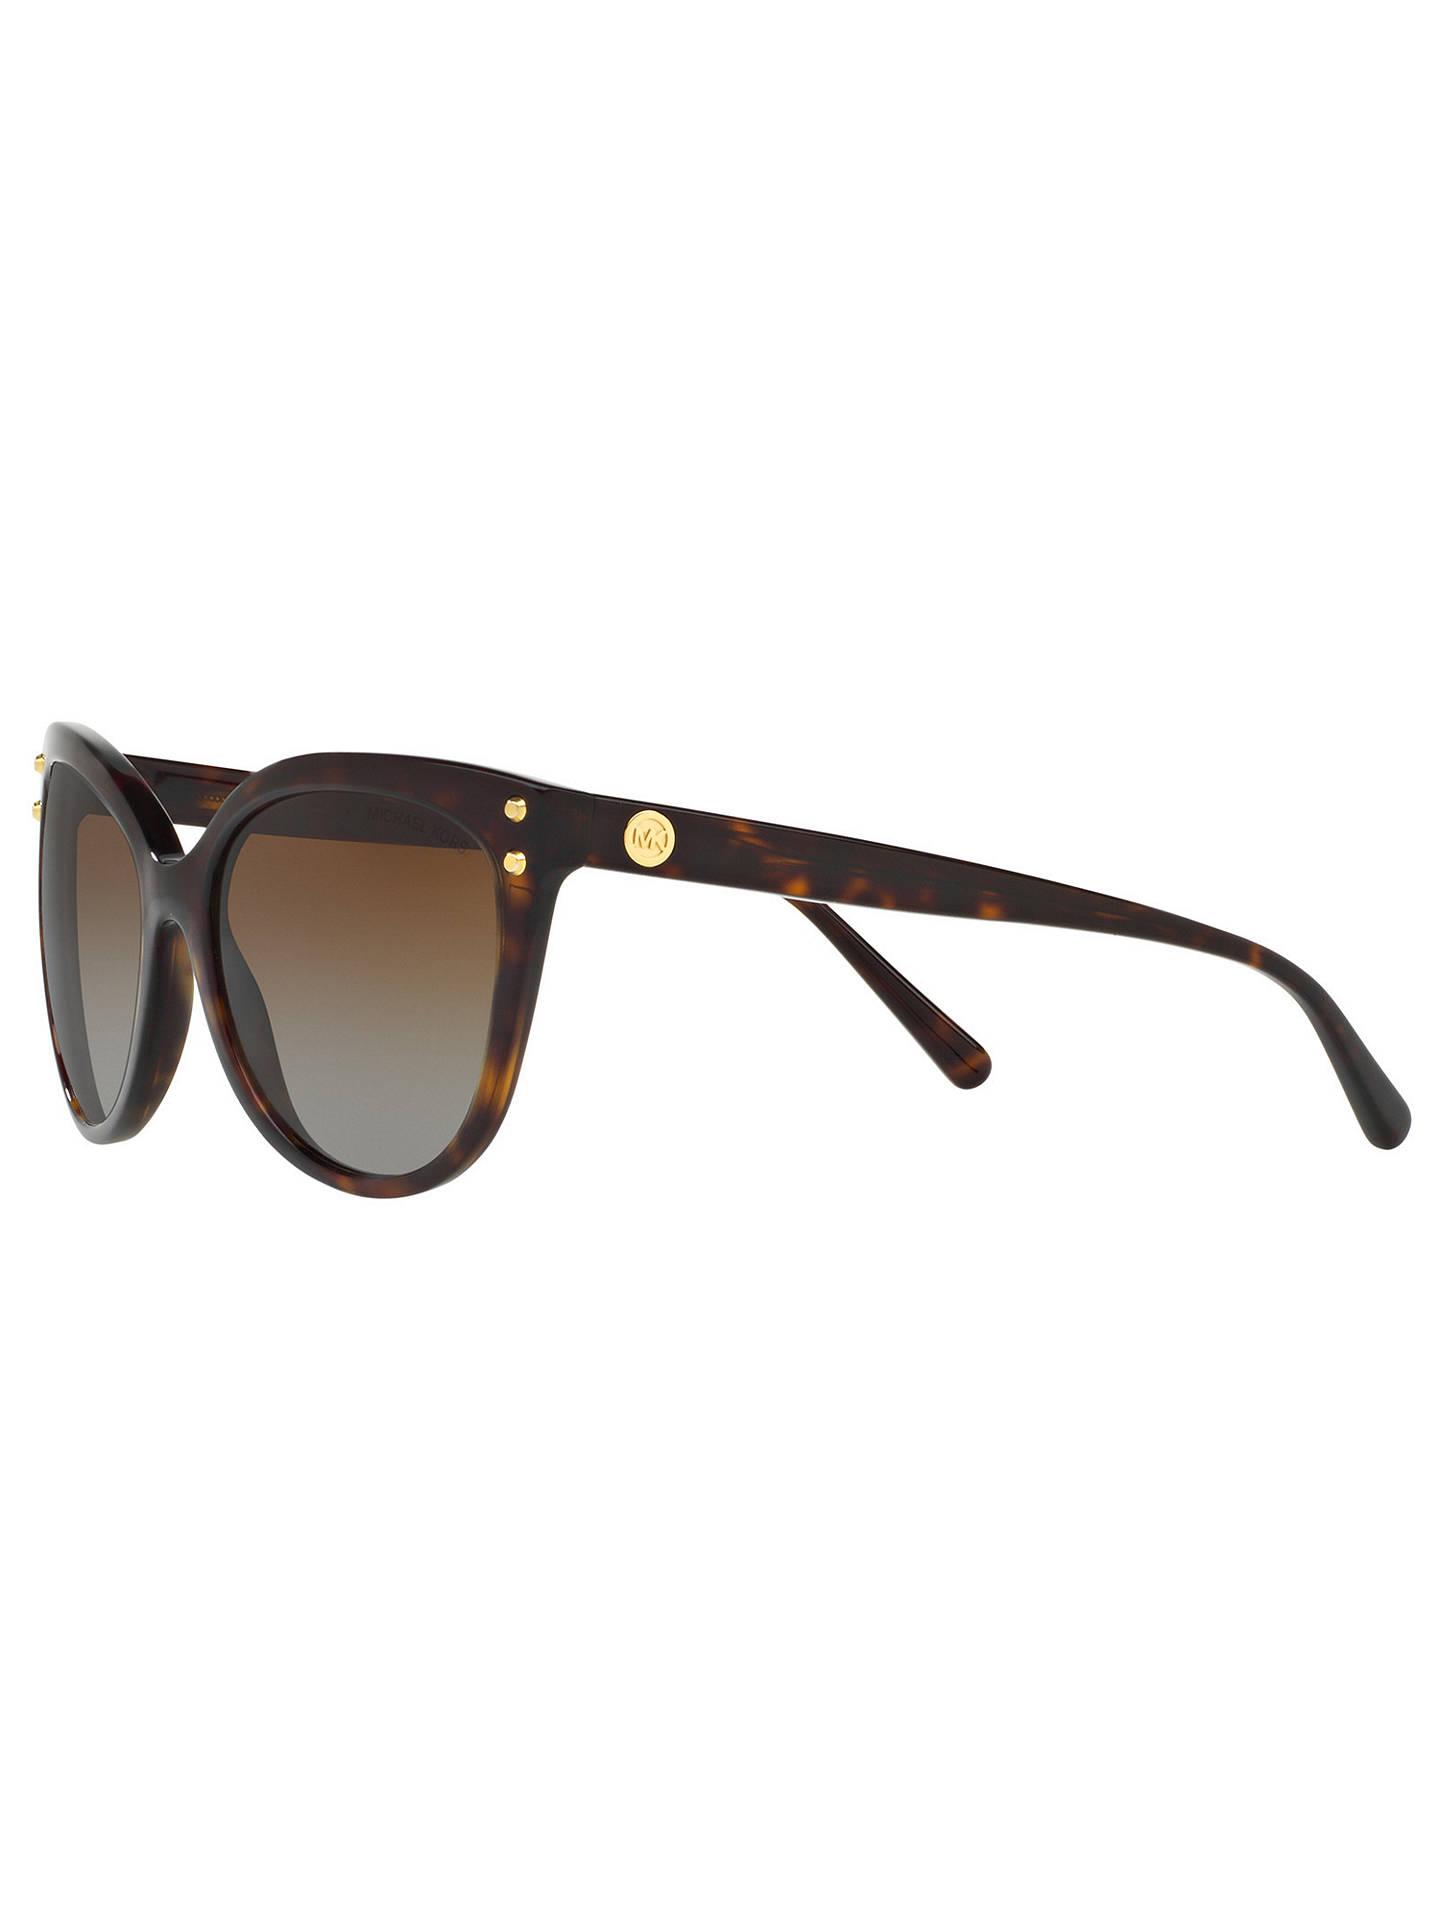 d938bf8cb7d0 ... Buy Michael Kors MK2045 Jan Polarised Cat s Eye Sunglasses